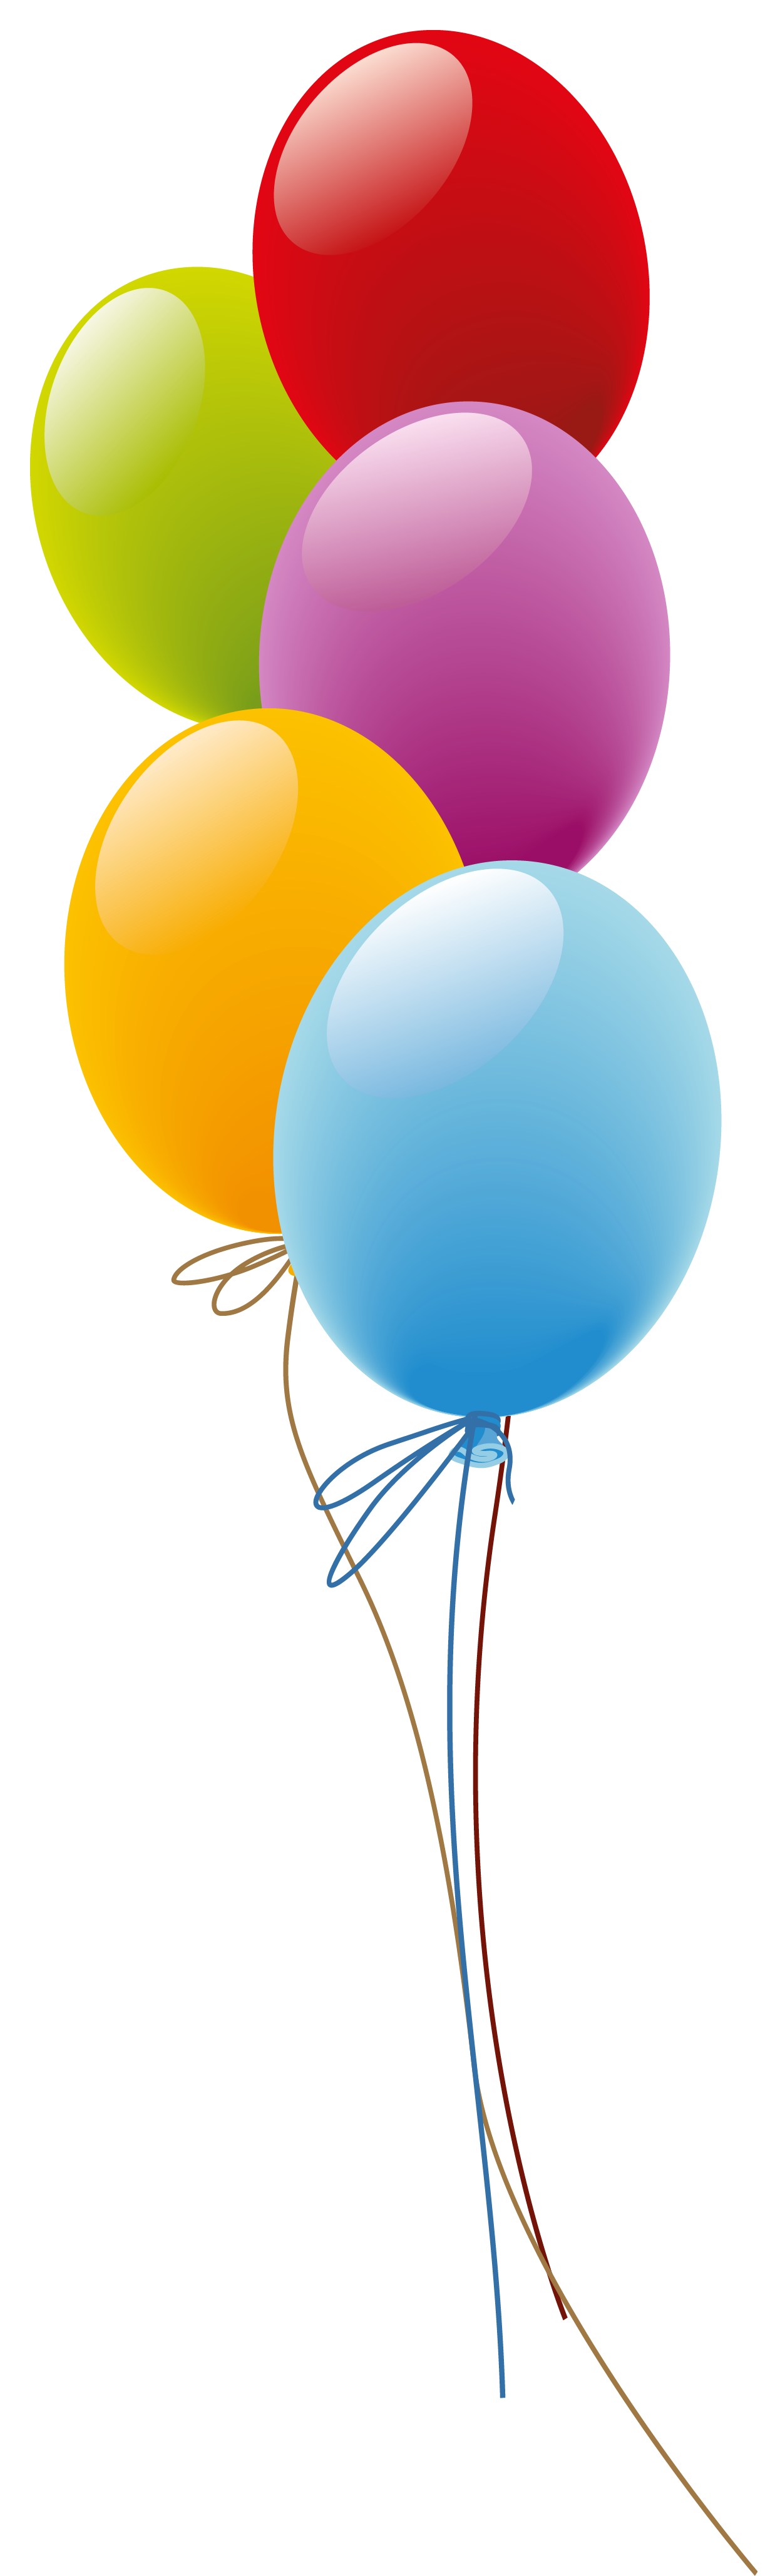 balloons png picture artistic elements balloons pinterest rh pinterest com Vacation Clip Art Birthday Balloons Clip Art